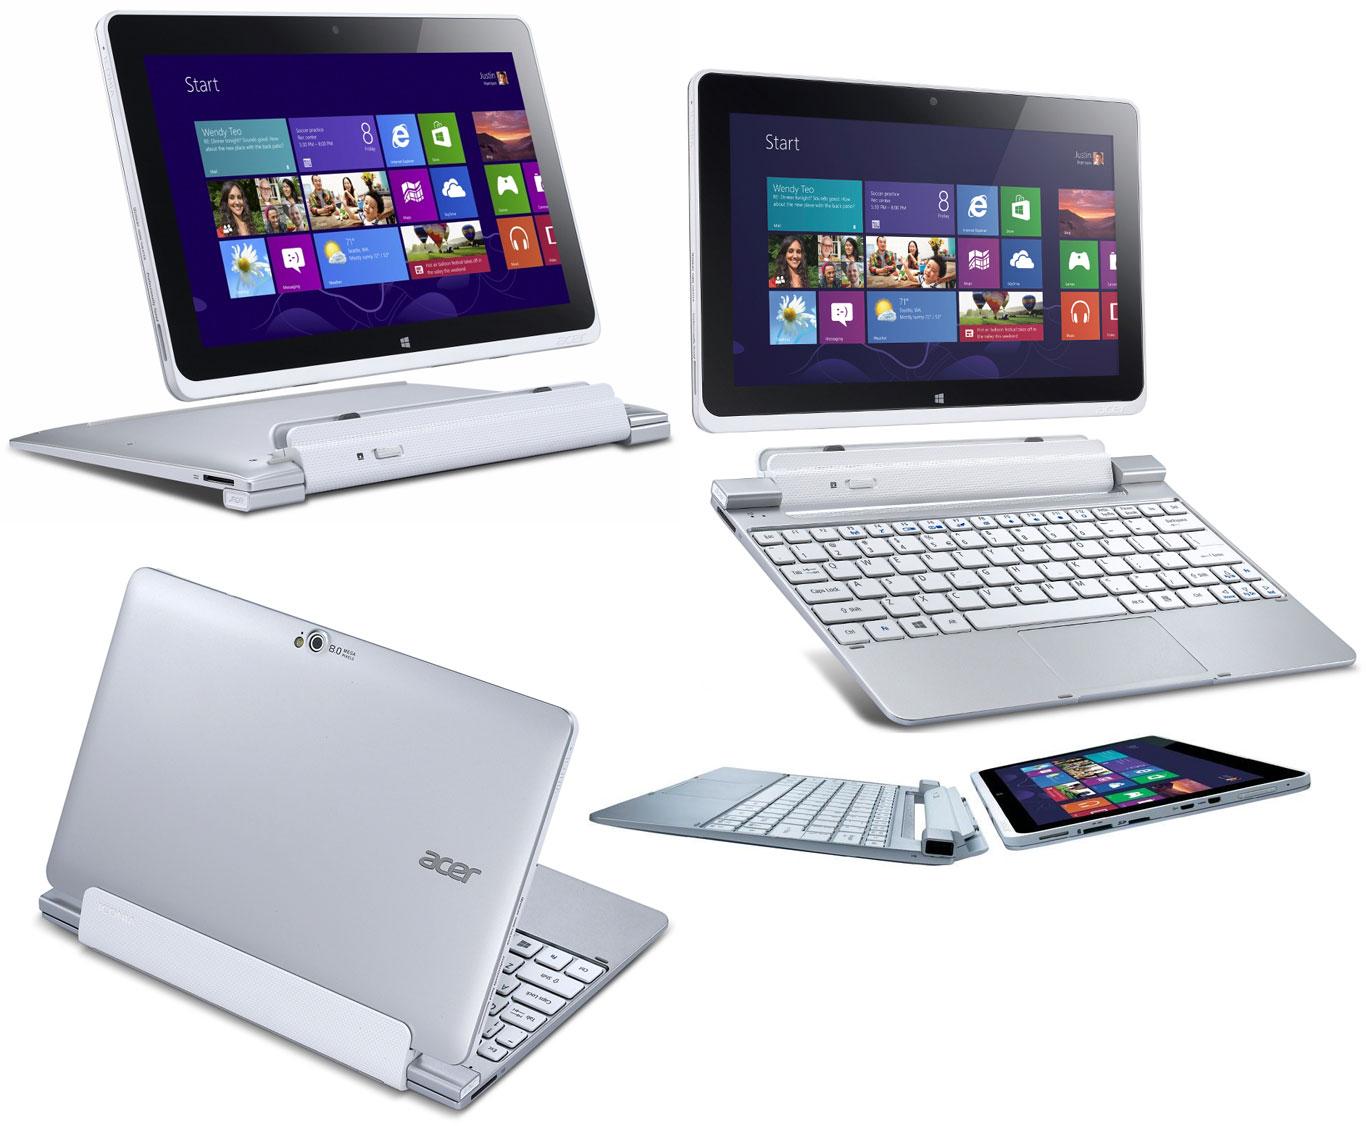 ACER Iconia Tab W511 64Gb - Какой планшет купить?